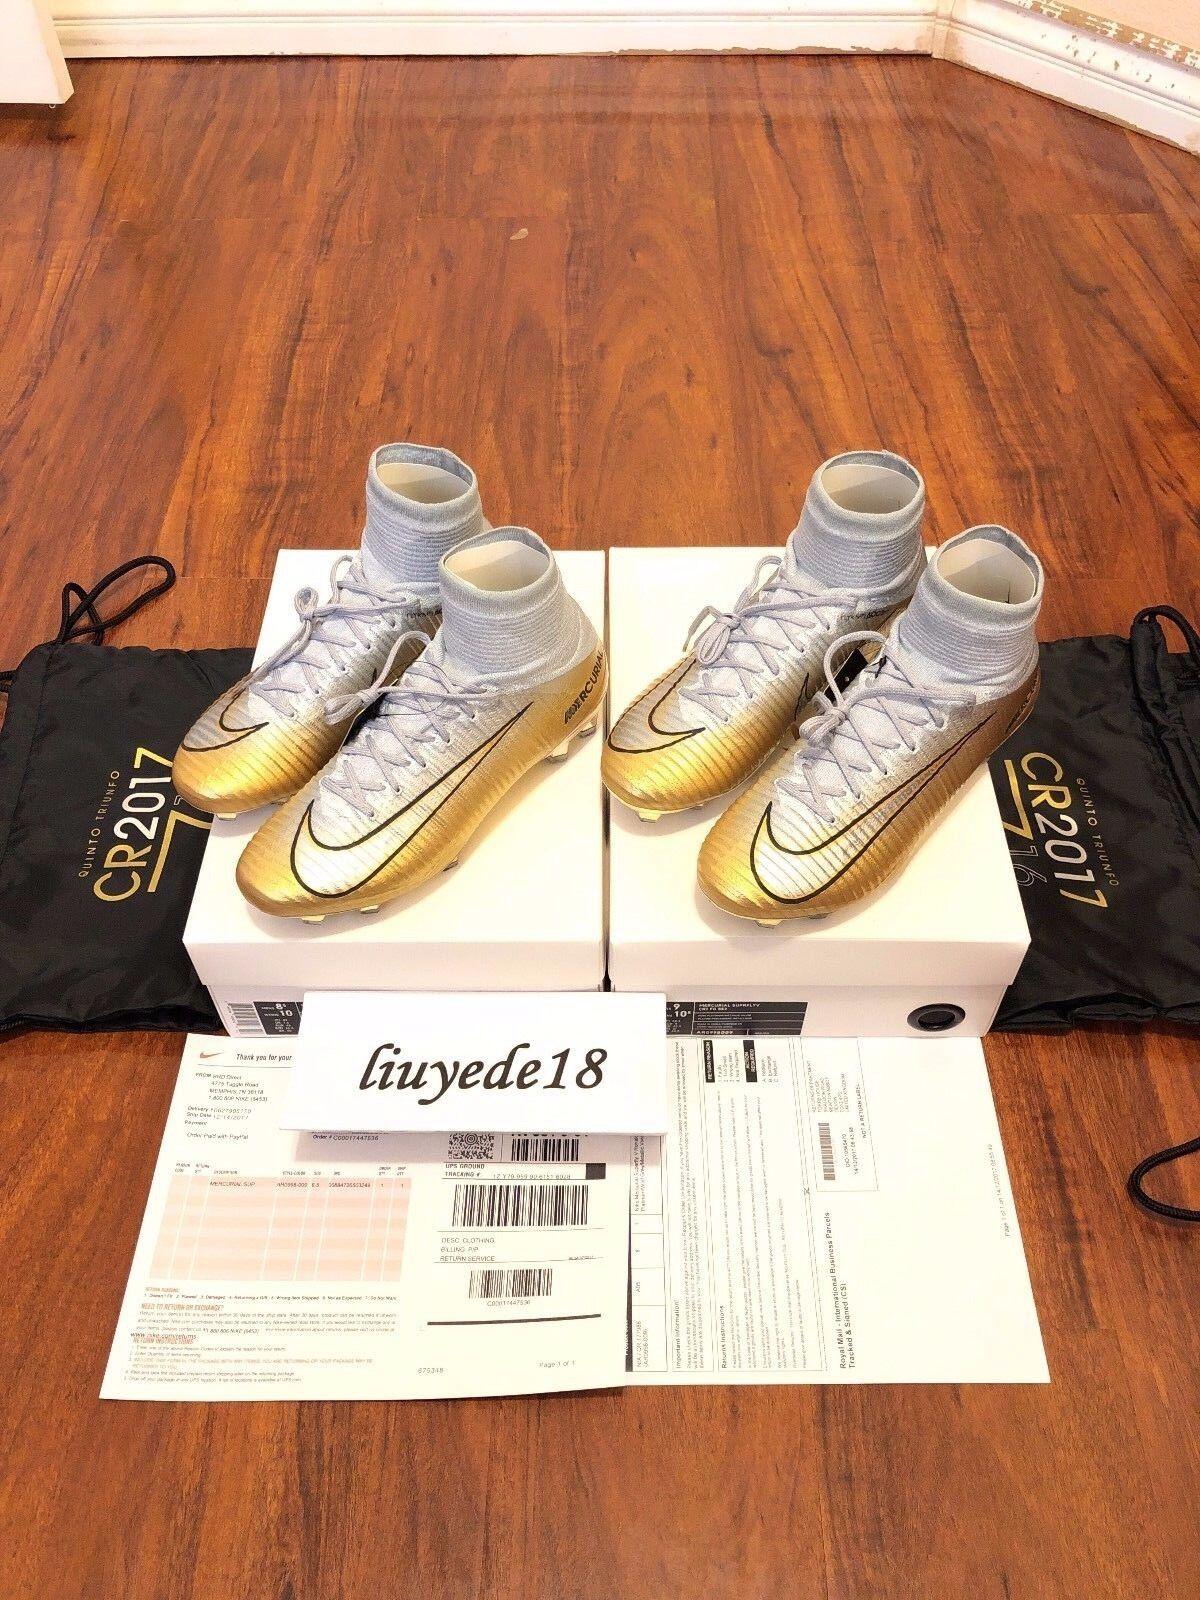 Nike MERCURIAL SUPERFLY V CR7 CR7 CR7 SE QUINTO TRIUNFO GOLD US 8.5 9 receipt AR0998 009 c5c50b